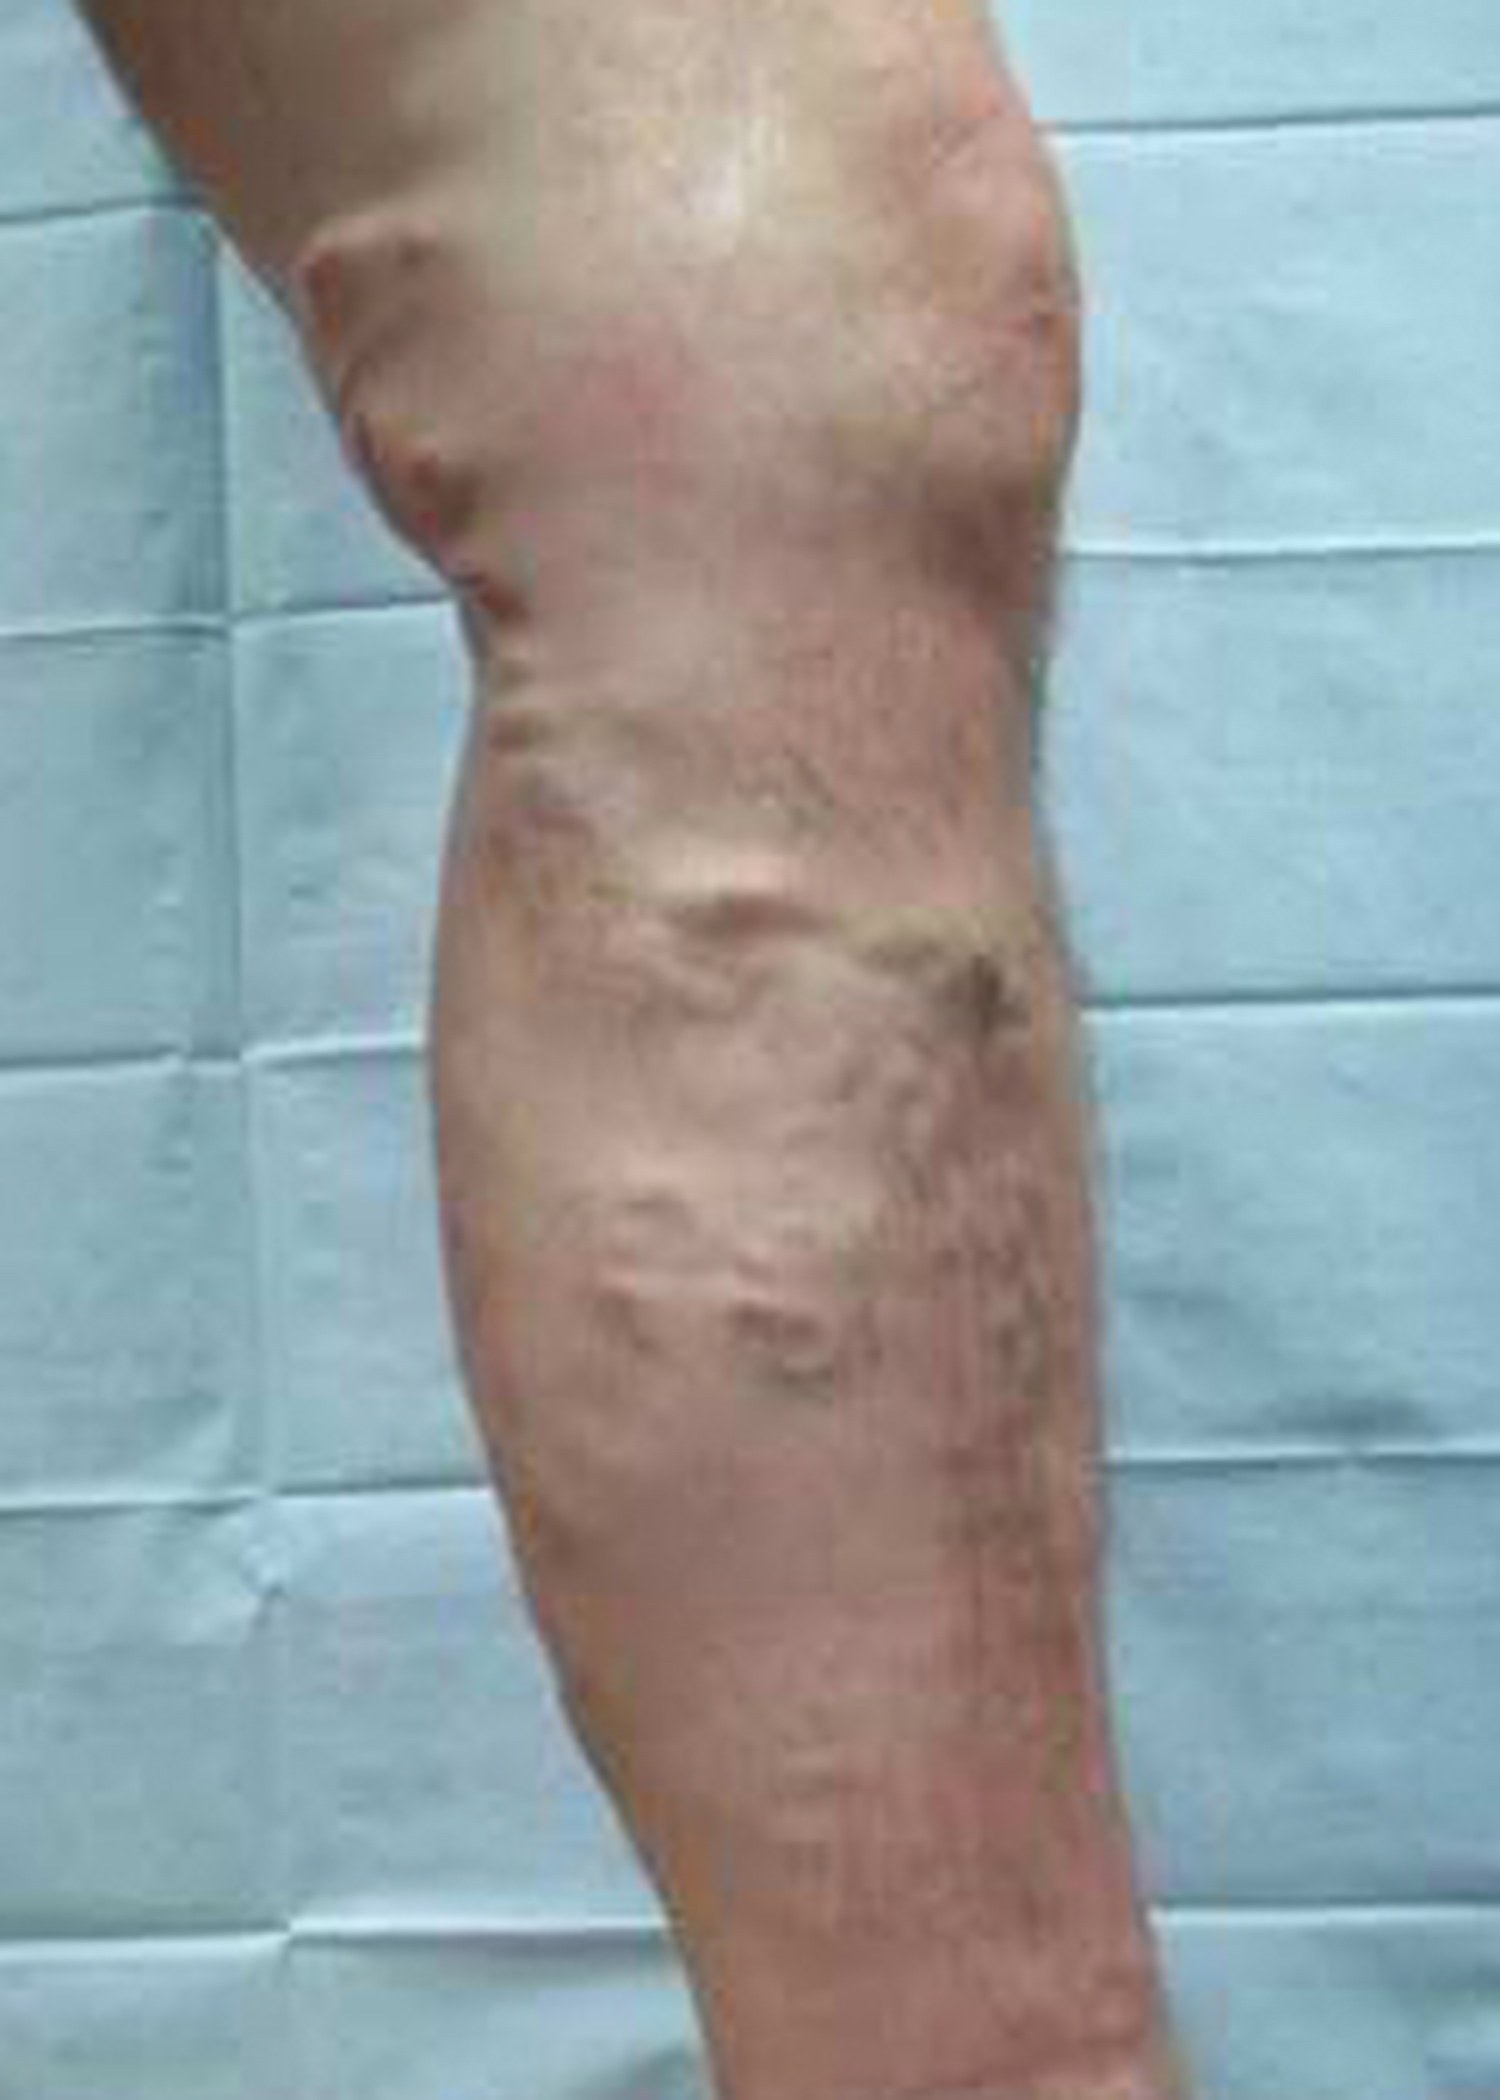 Premier Vascular & Vein Center | Varicose Veins Treatment & Procedures | Knoxville, TN